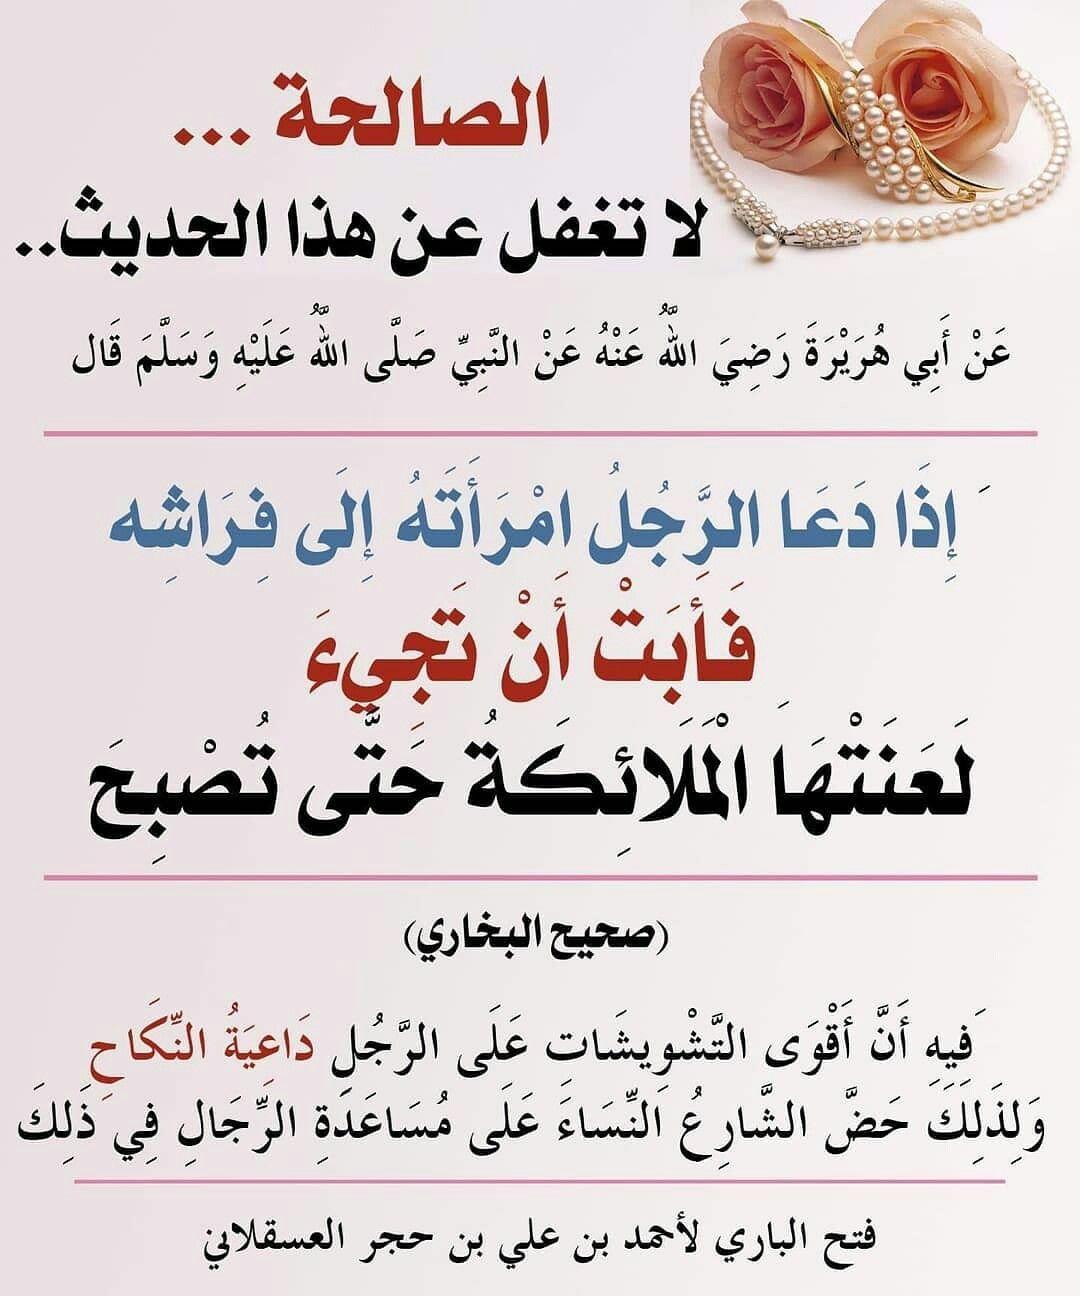 Pin By مرفأ العفاف On أحاديث نبوية Ahadith Islamic Quotes Quotes